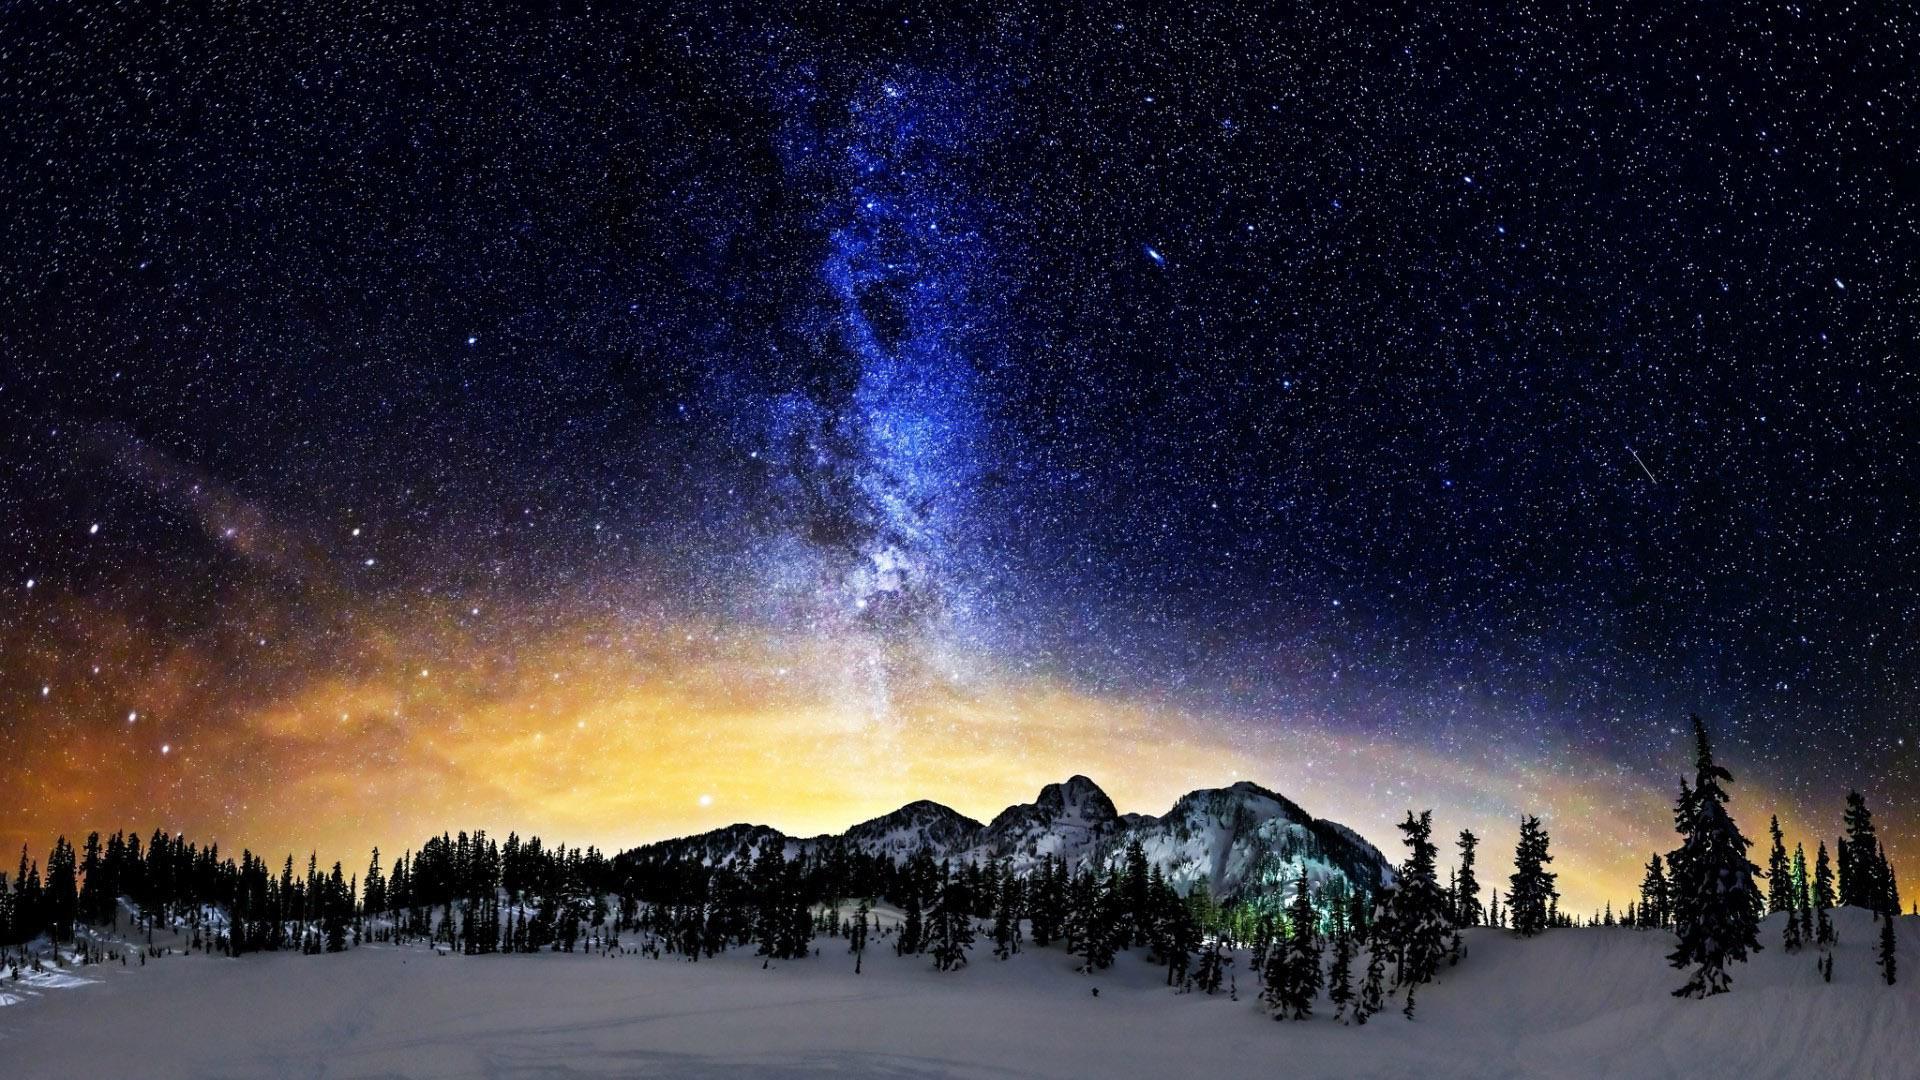 Amazing Milky Way Wallpapers: Milky Way Wallpapers HD